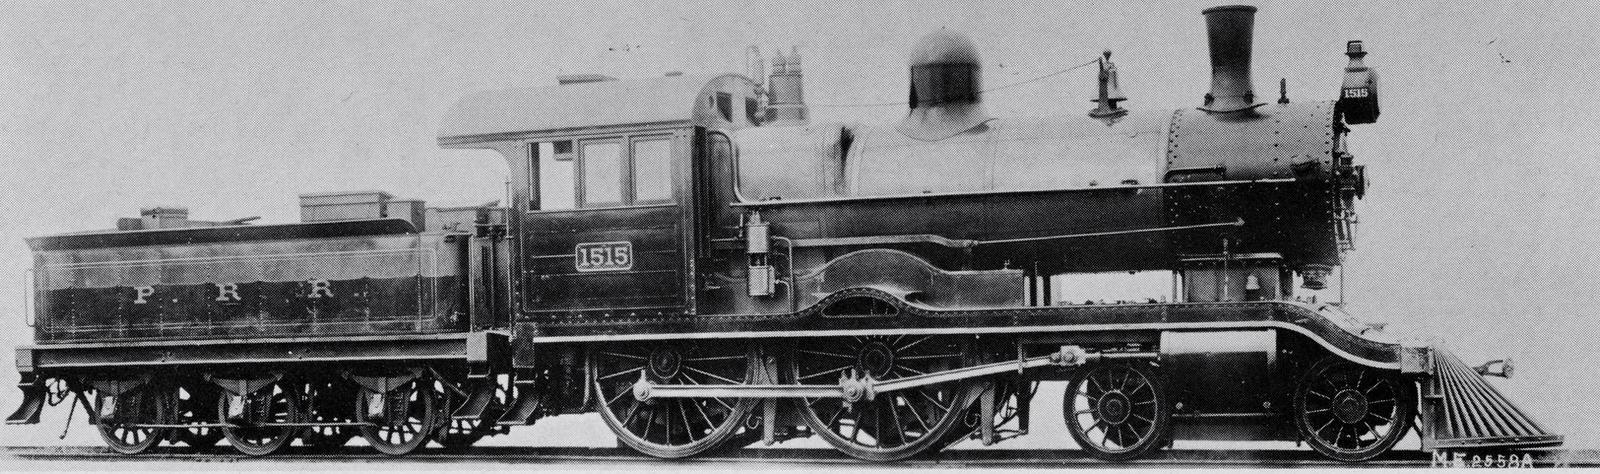 Pennsylvania Railroad 1515 by SteamRailwayCompany on DeviantArt